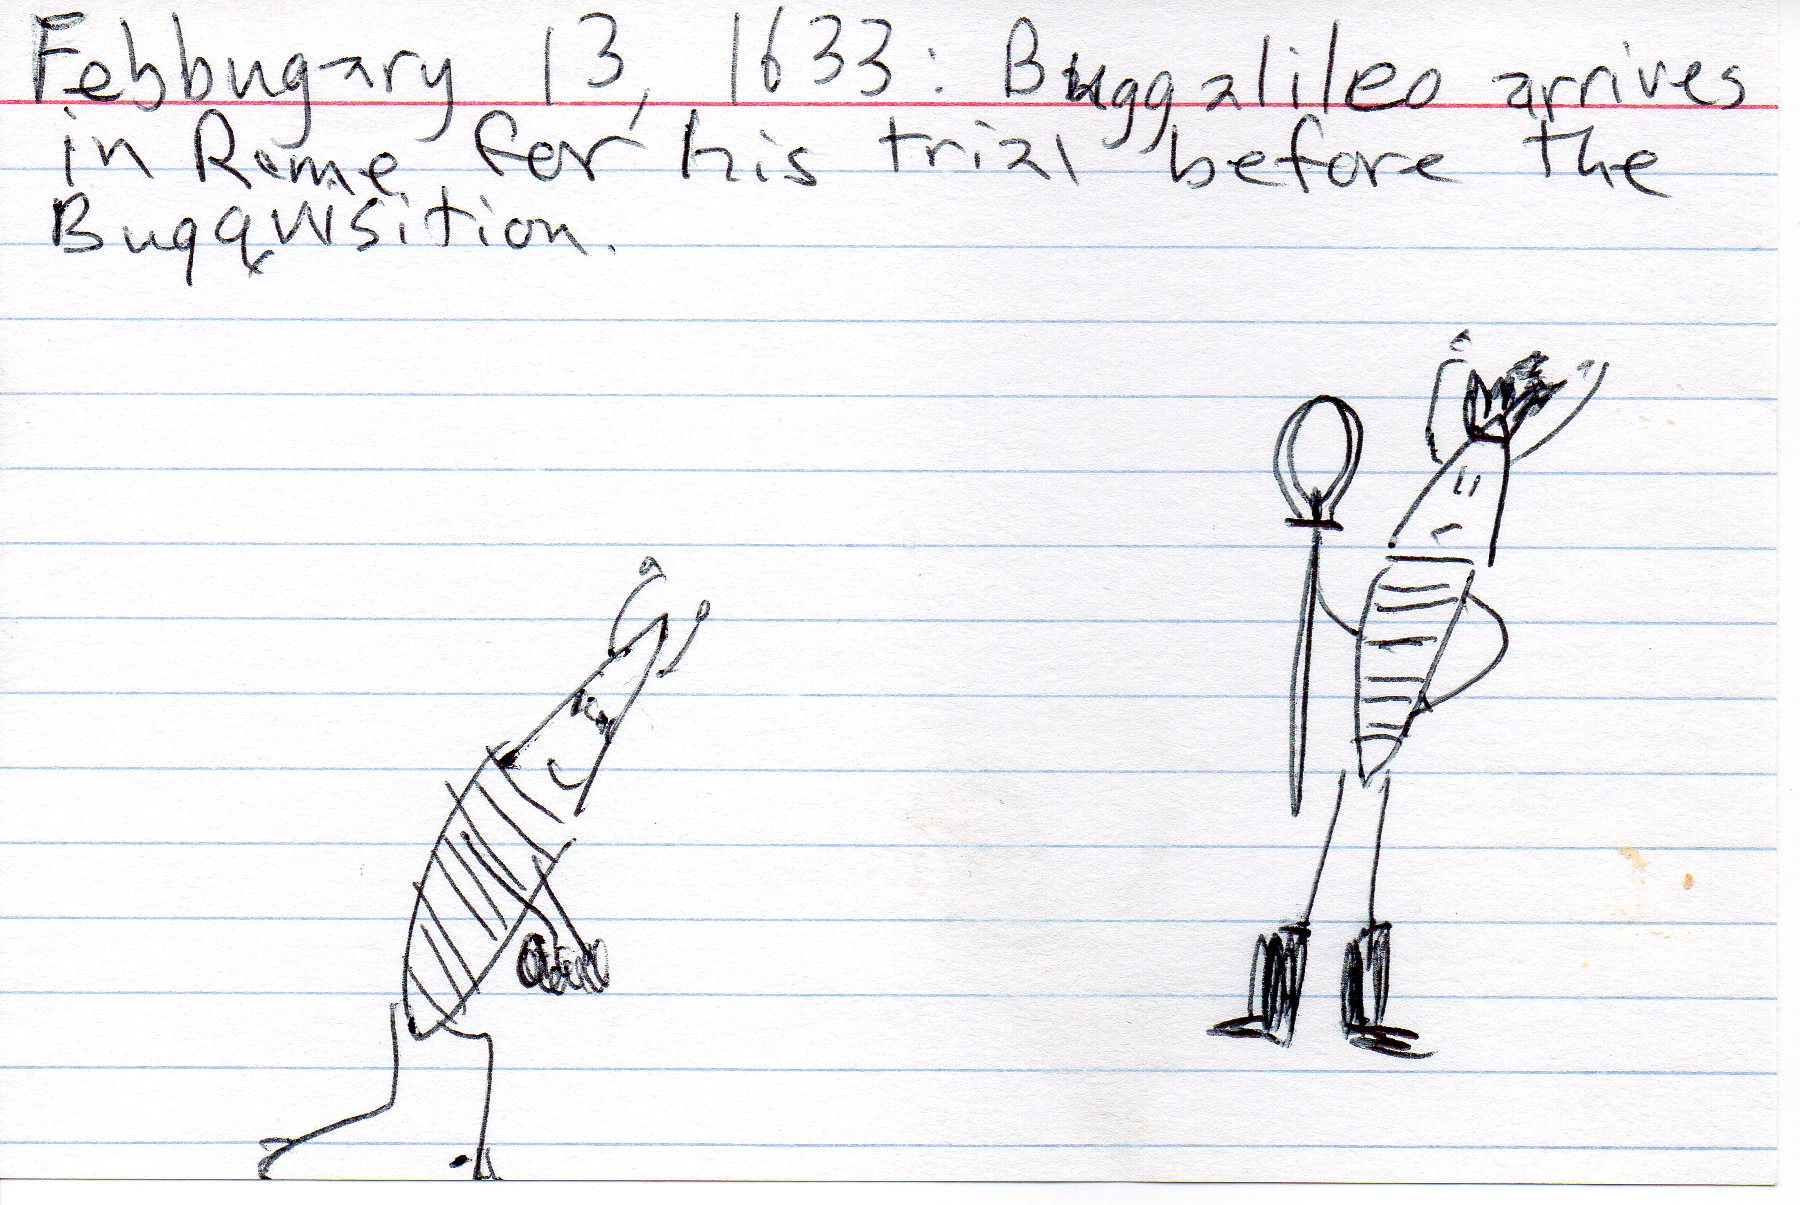 buggaleo [click to embiggen]